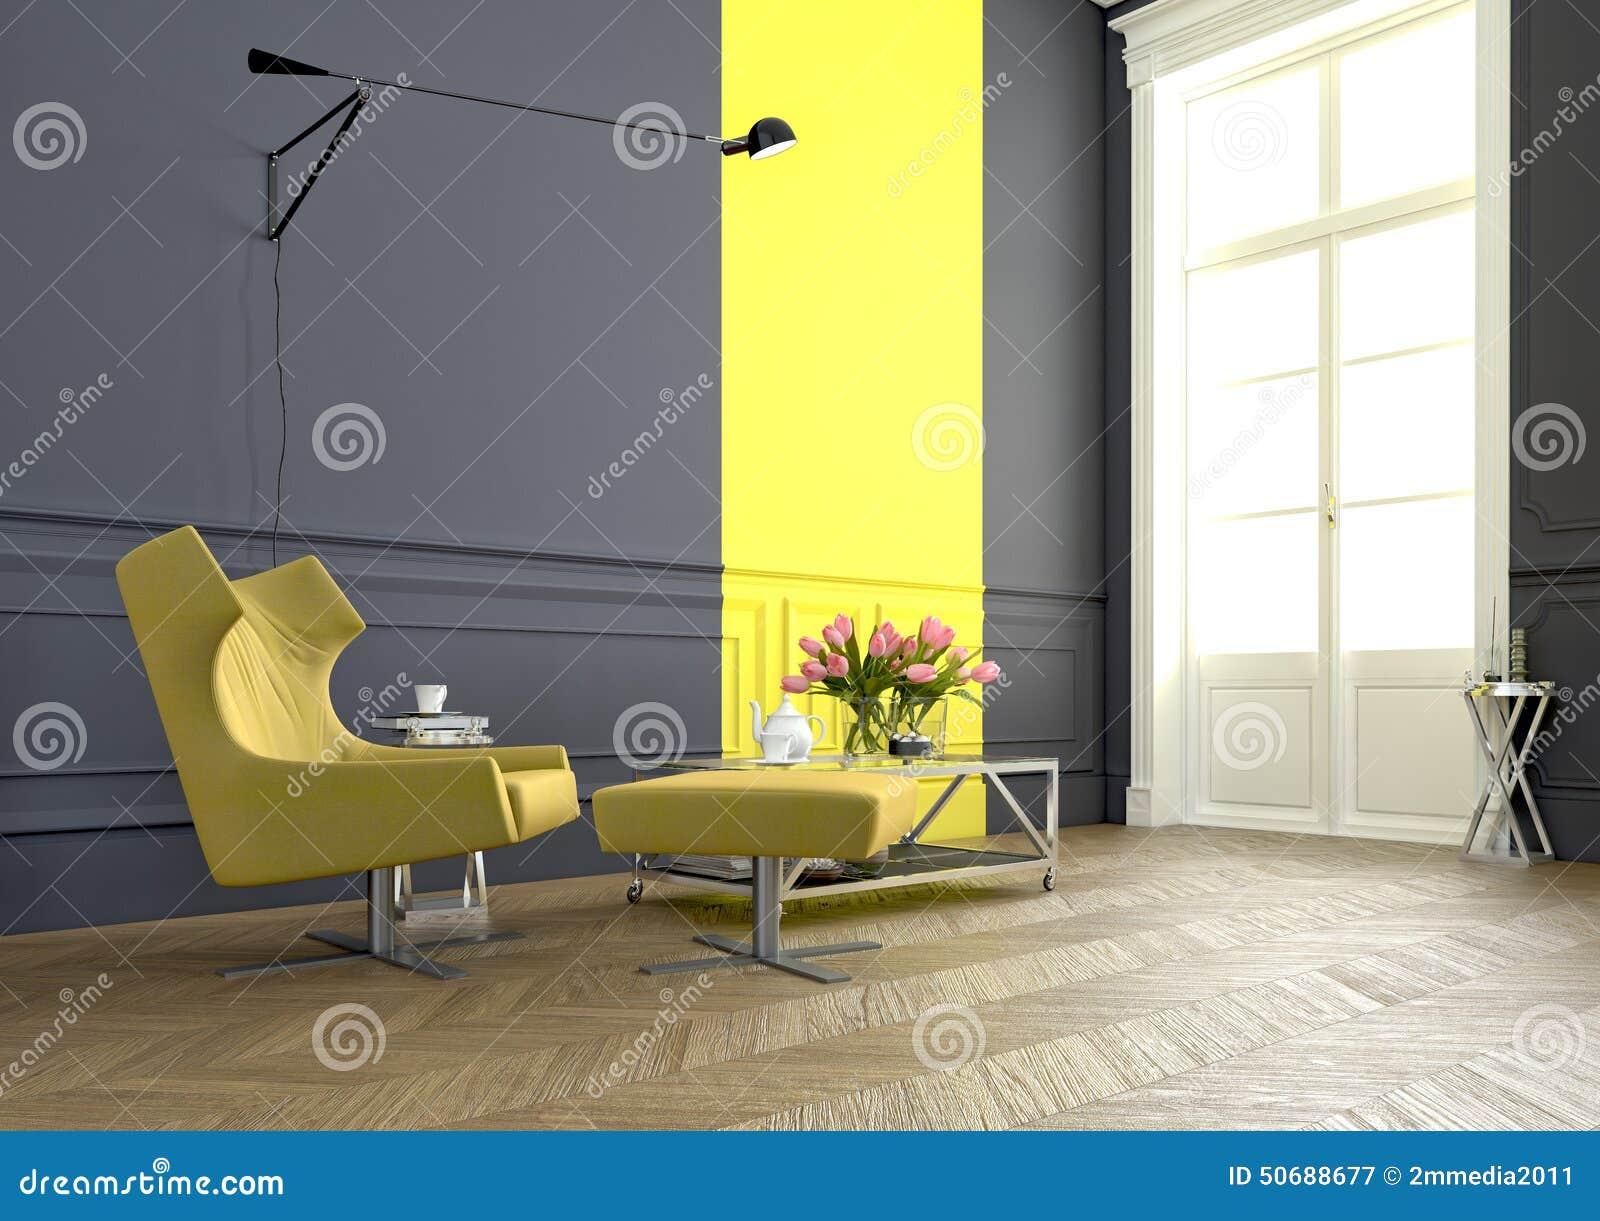 Download 胳膊椅子经典家具家内部样式 3d翻译 库存例证. 插画 包括有 家具, 对象, 装备, 休闲, 方式, 背包 - 50688677